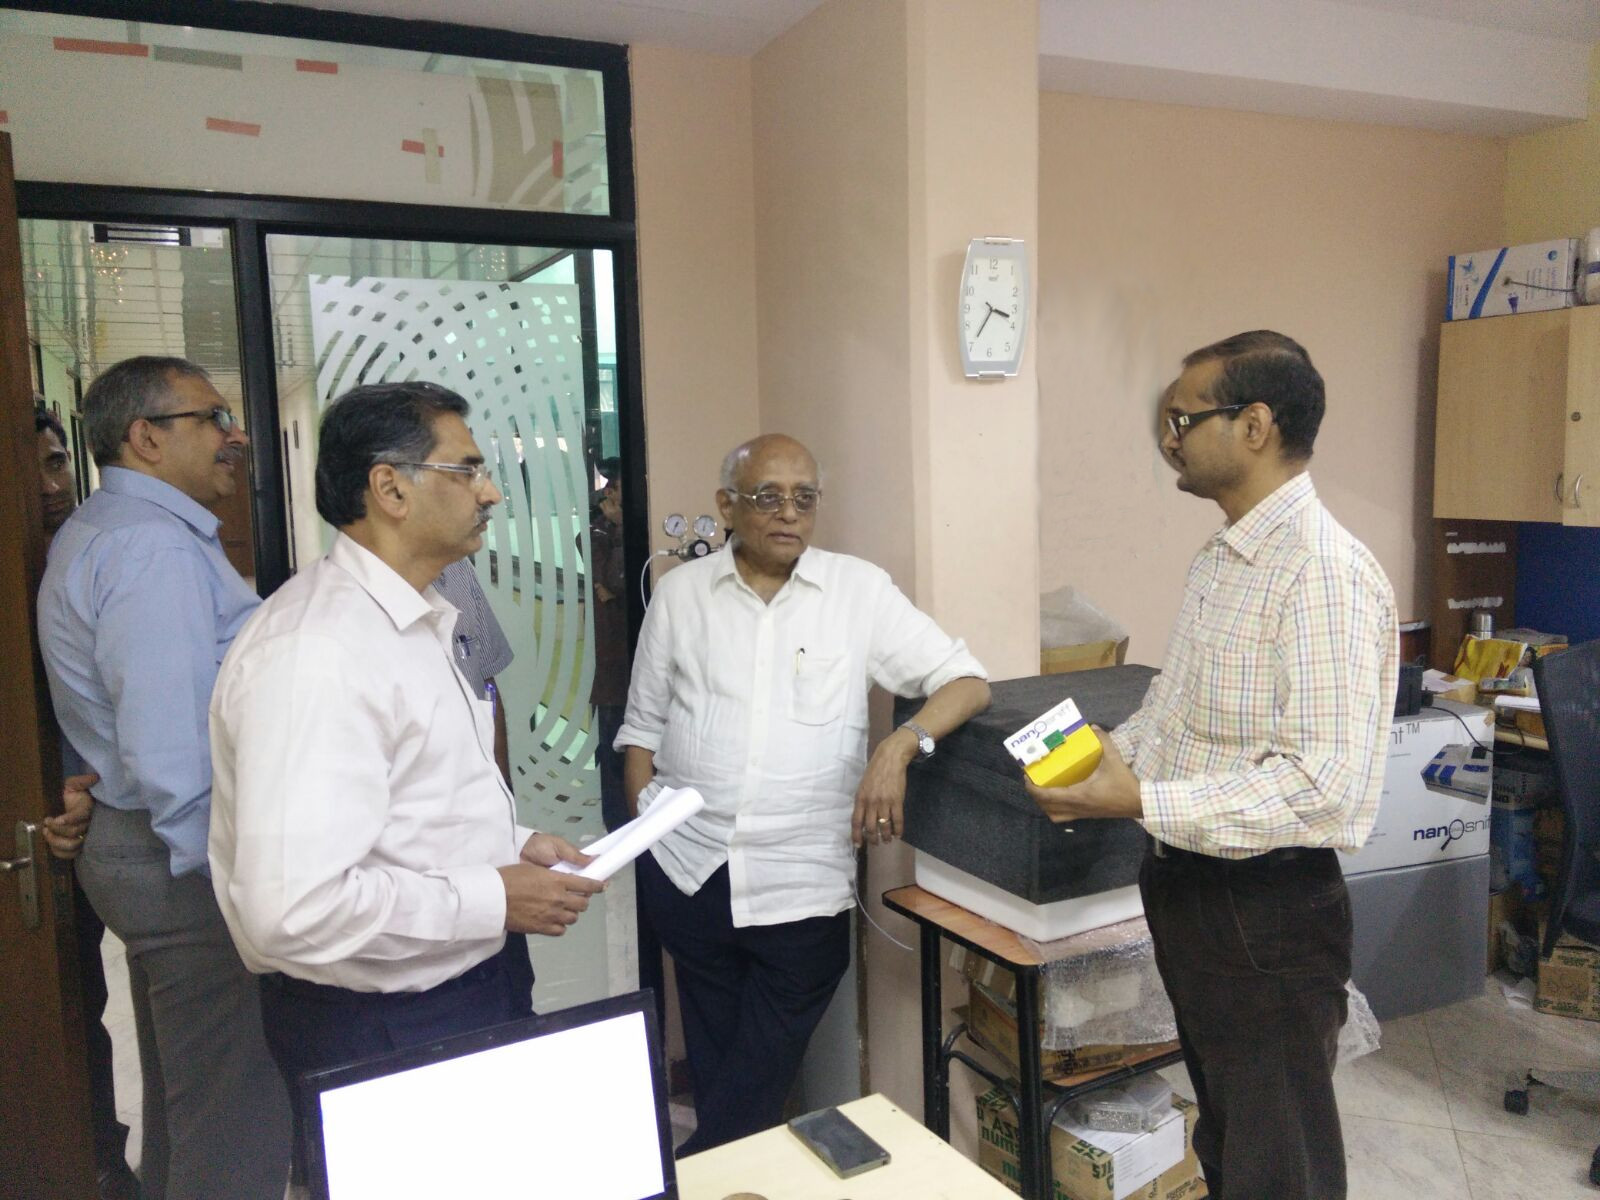 Padma Shri and Padma Vibhushan awardee, Dr. Rajagopala Chidambaram's visit to NanoSniff